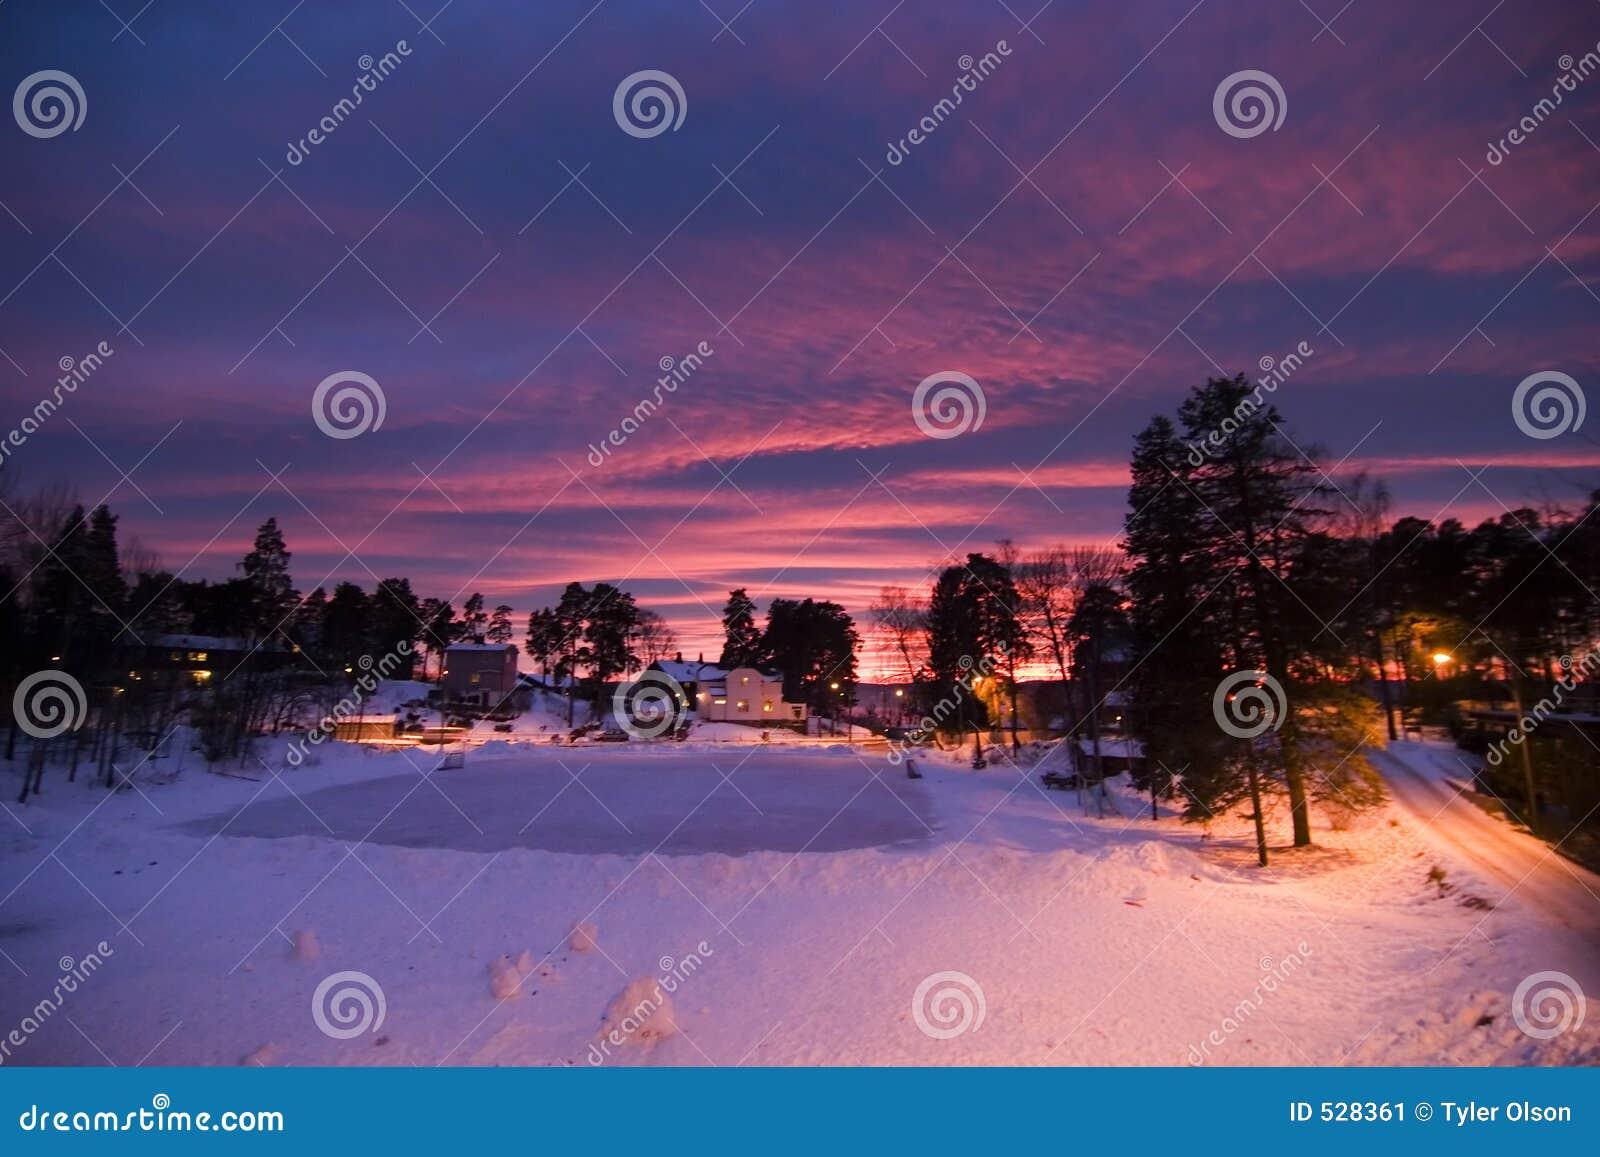 Download 紫色日落 库存图片. 图片 包括有 alina, 紫色, 都市, 日落, beautifuler, 斯堪的纳维亚语 - 528361